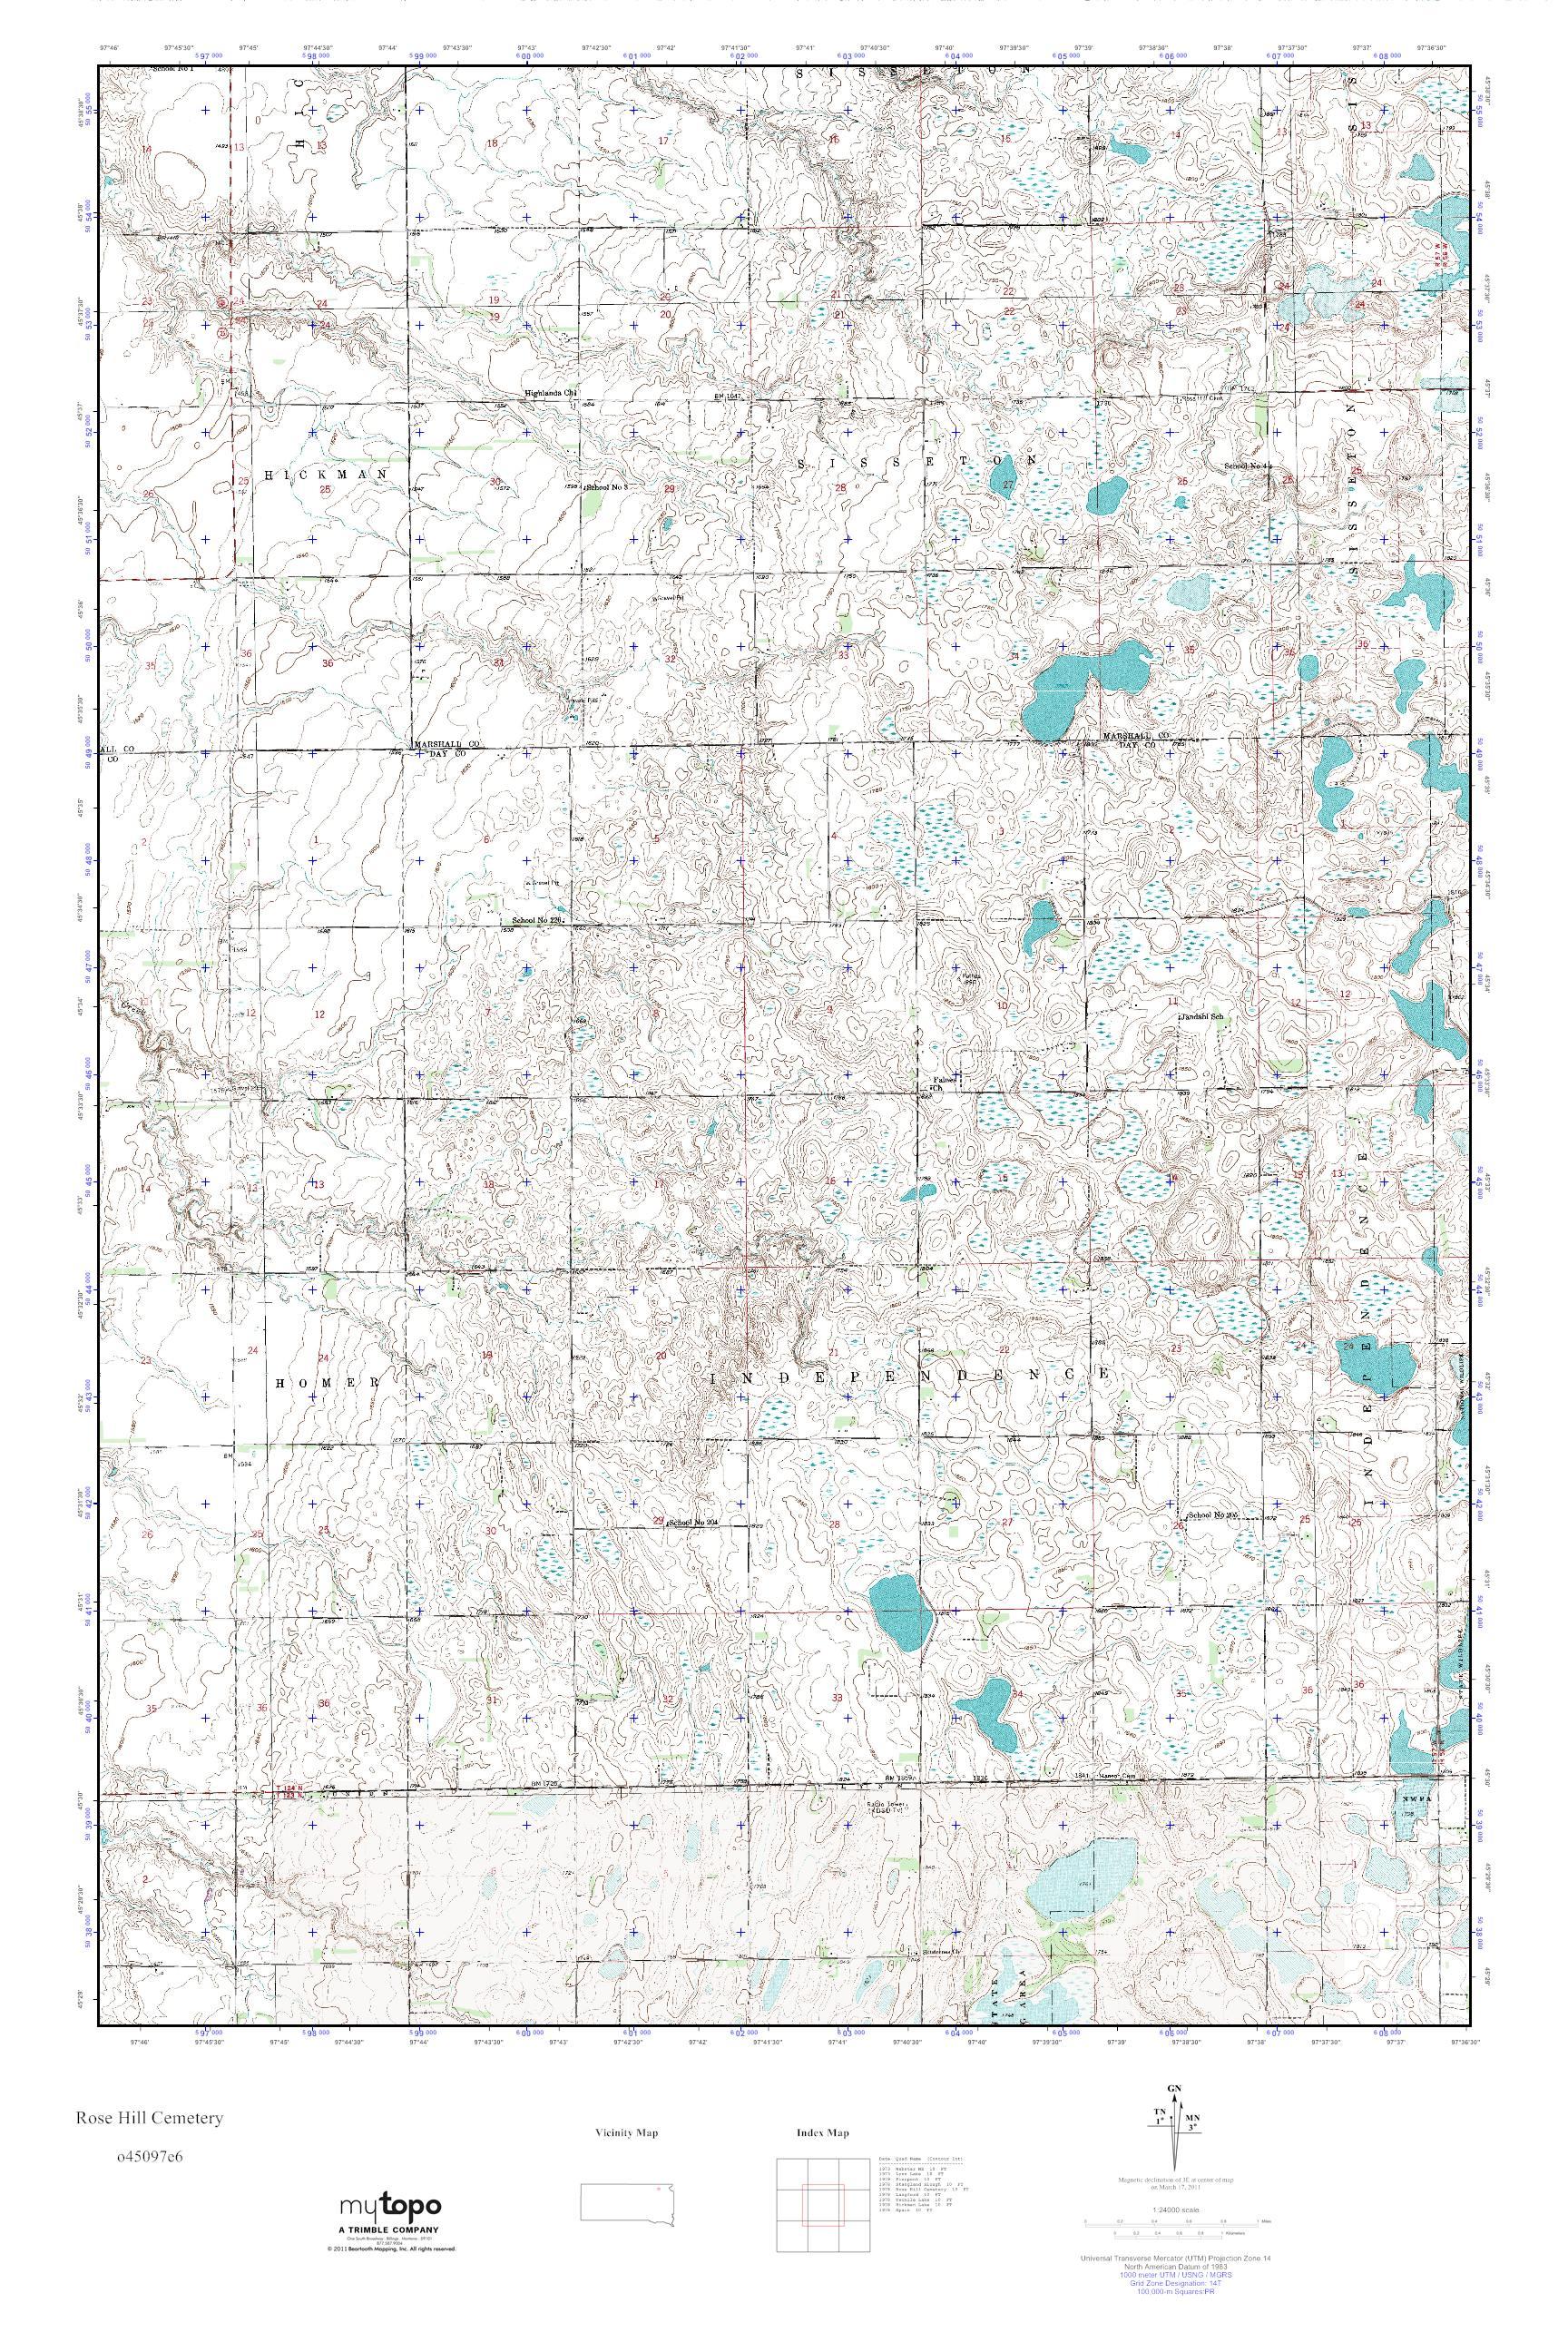 Mytopo Rose Hill Cemetery South Dakota Usgs Quad Topo Map